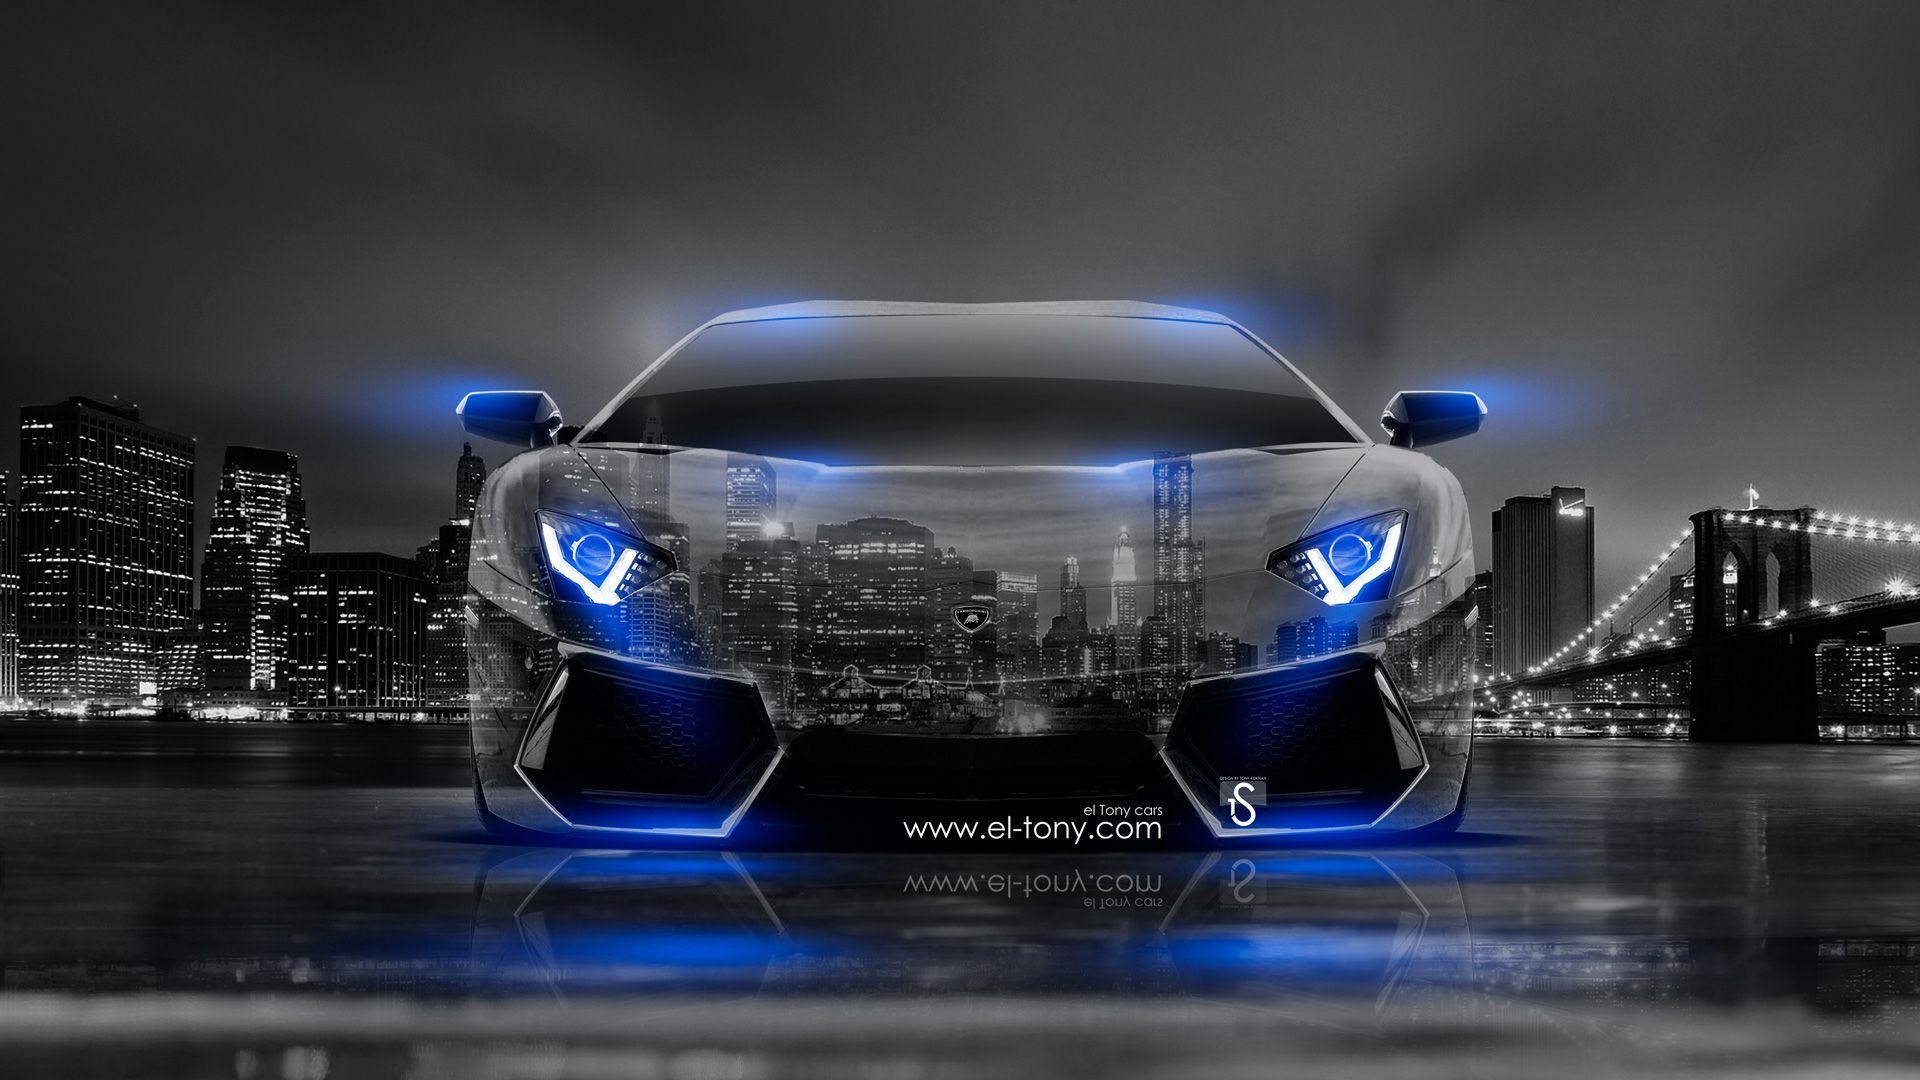 Beautiful Black Lamborghini With Neon Blue Lights Gallery